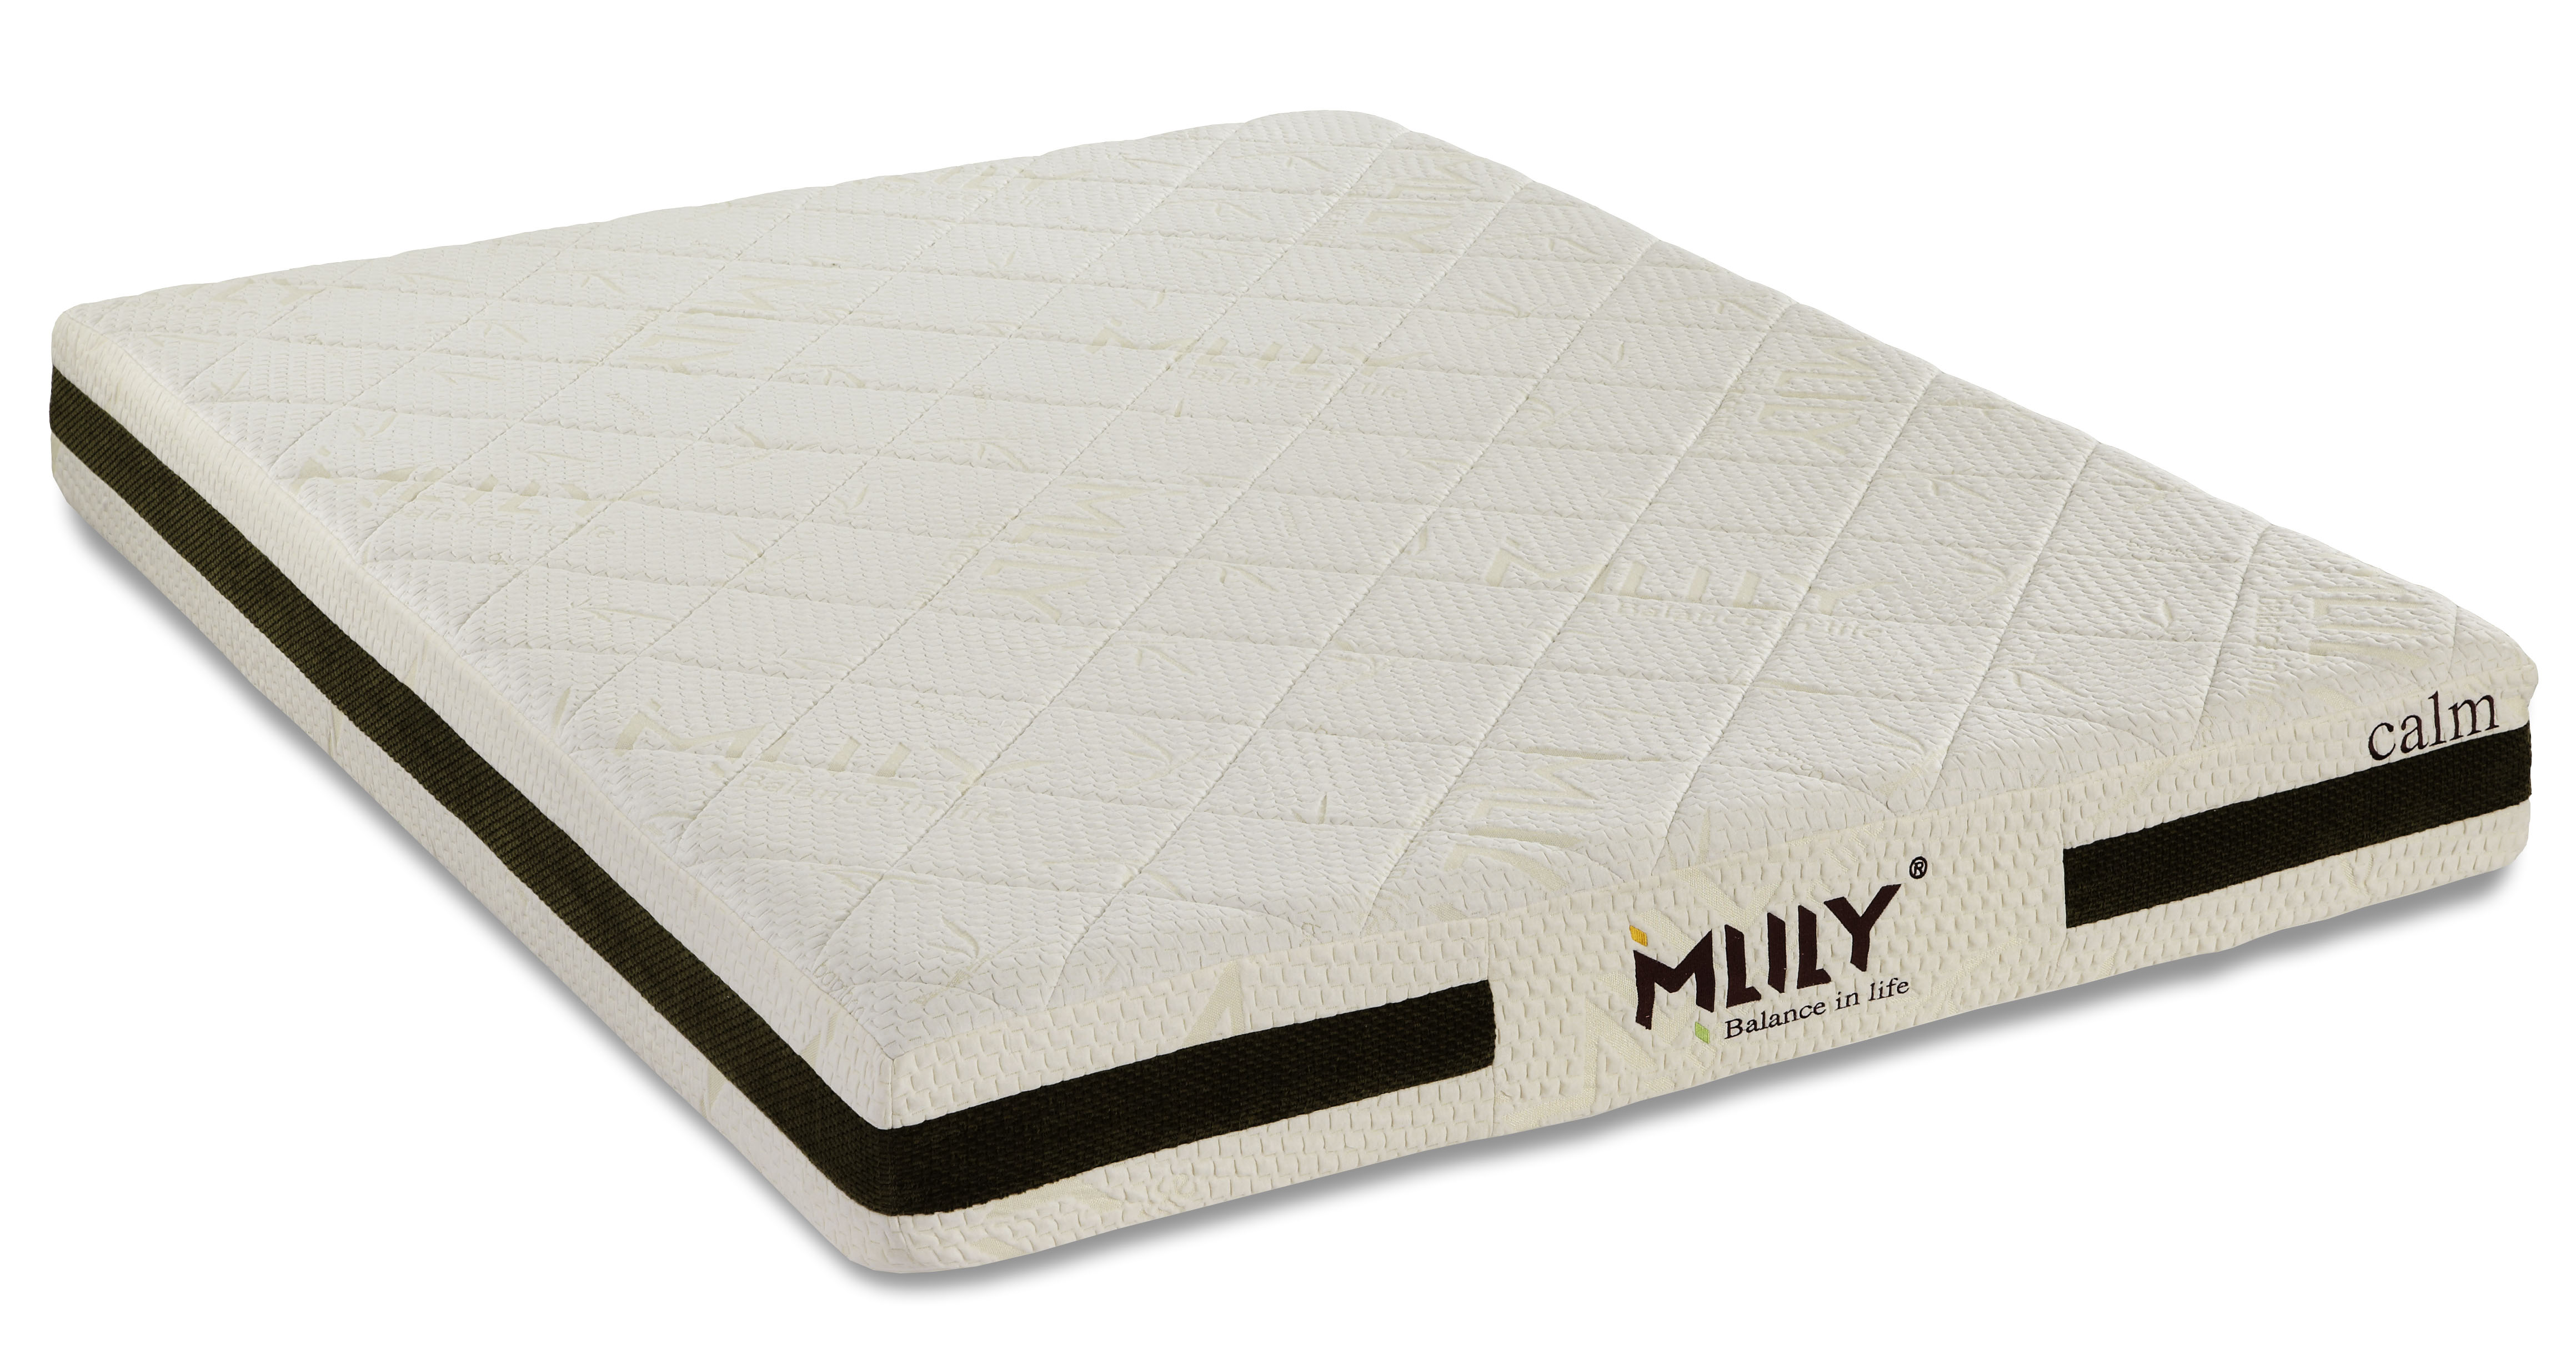 Calm 8 Inch Memory Foam Mattress by Mlily